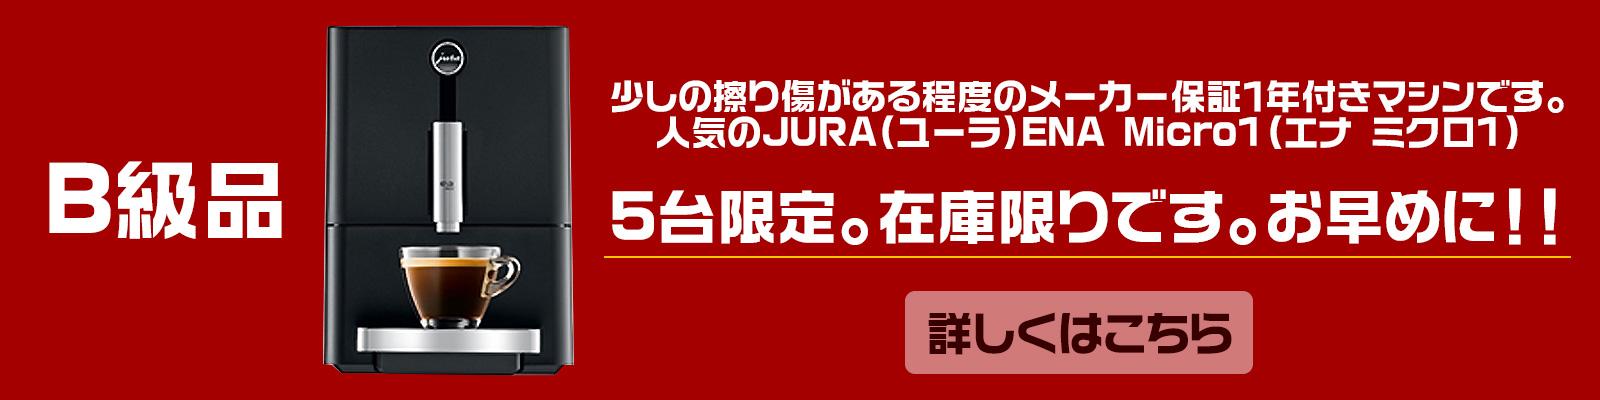 JURA(ユーラ)ENA Micro1(エナ ミクロ1)※5台限定。B級品